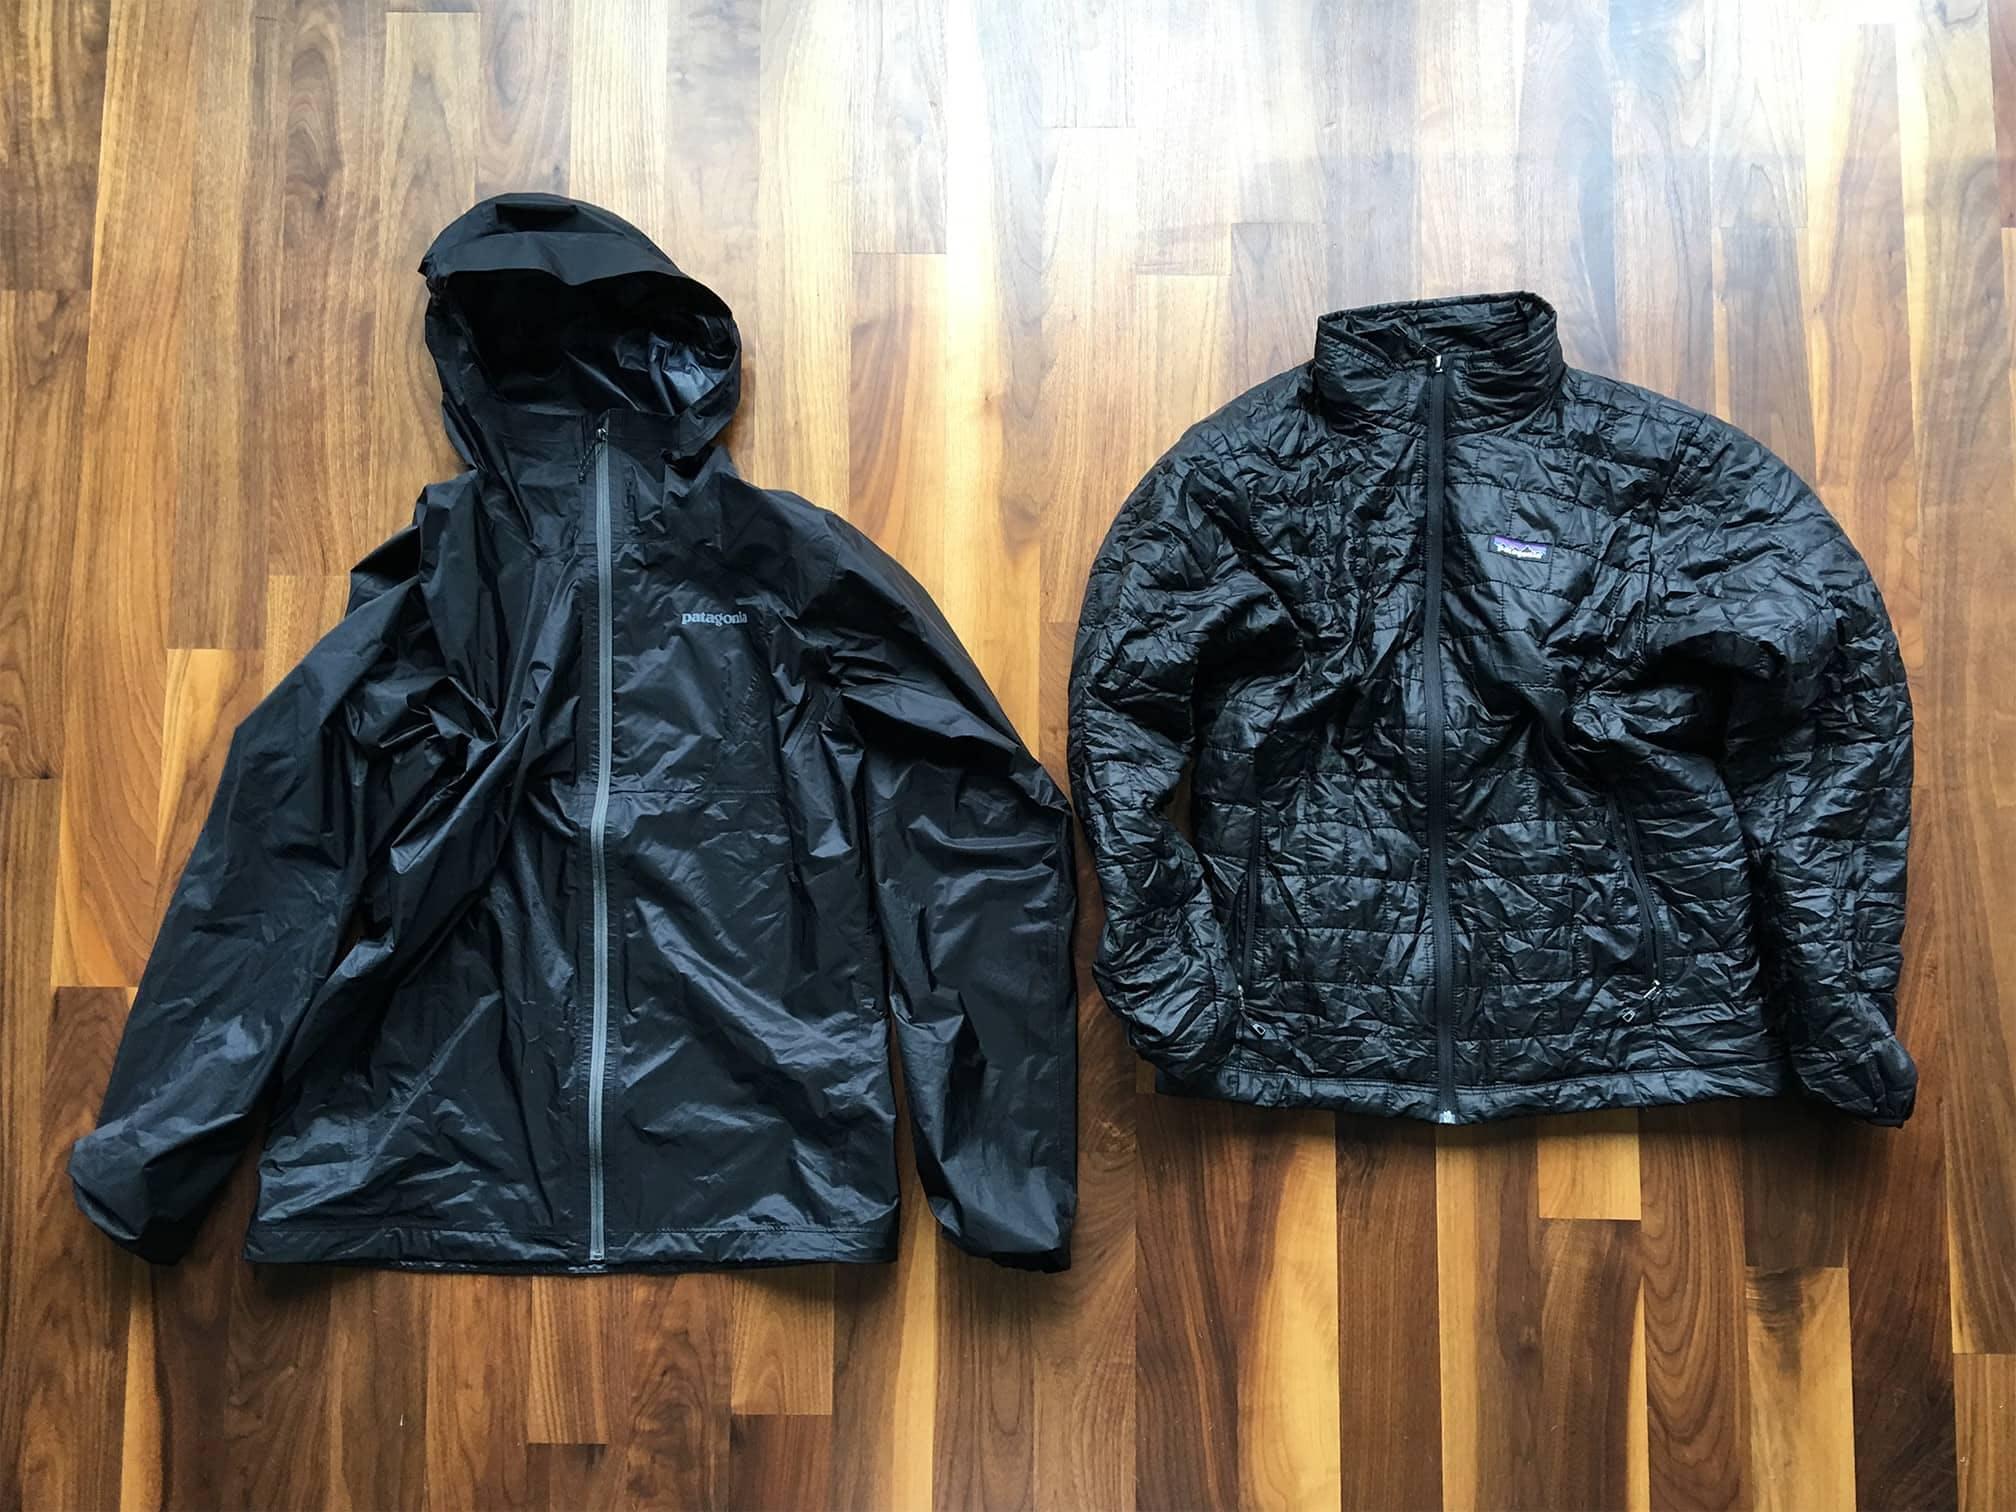 Patagonia Alpine Houdini Jacket | Patagonia Nano Puff Jacket